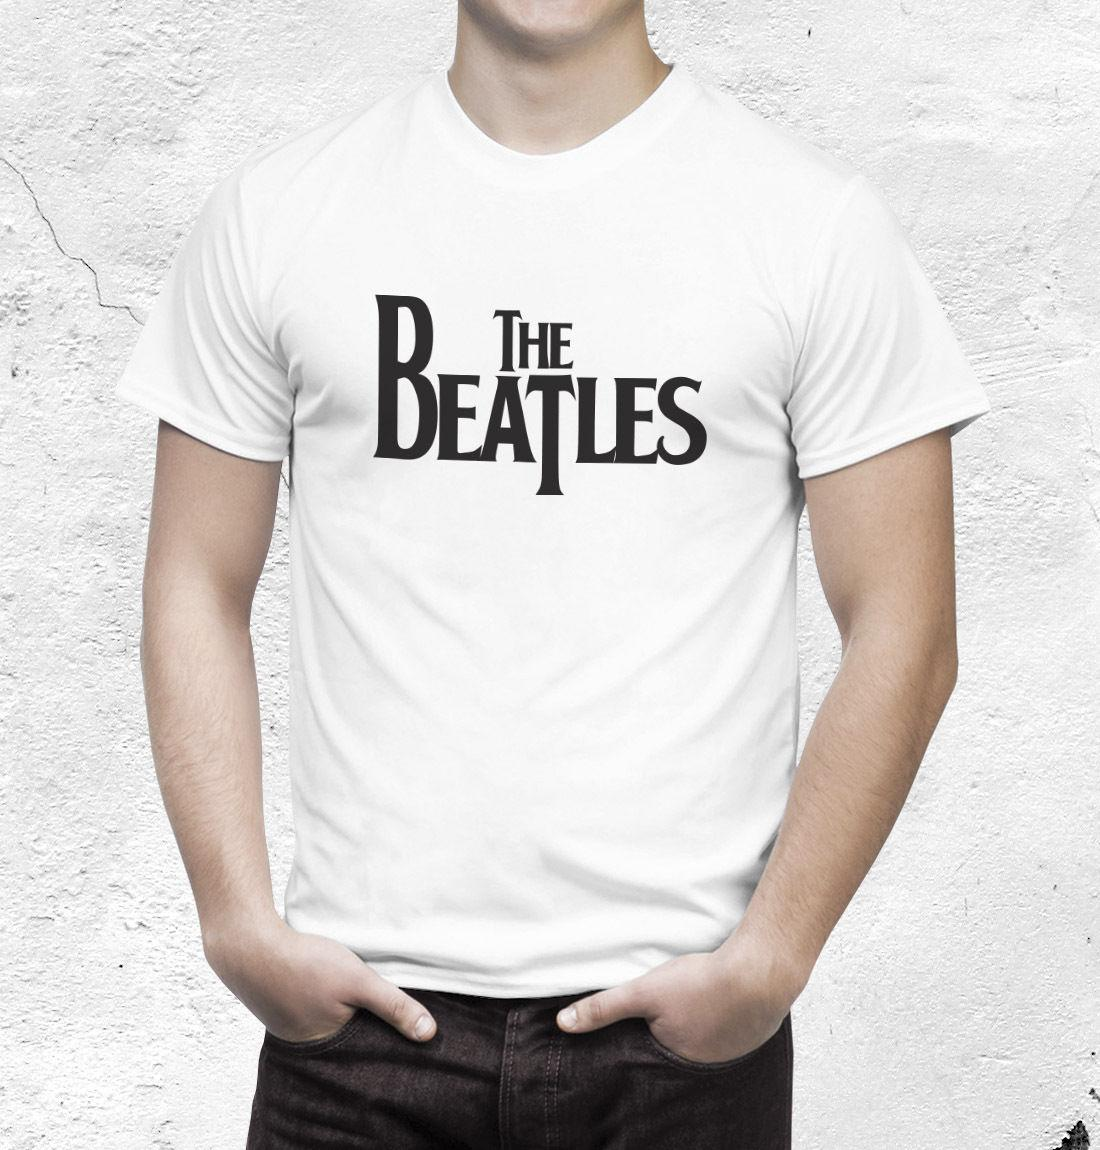 b85e4b79 The Beatles Classic T Shirt John Lennon Paul McCartney T Shirt Cool Casual  Pride T Shirt Men Unisex New Fashion Tshirt Shirts Mens Cool T Shirts  Designs ...